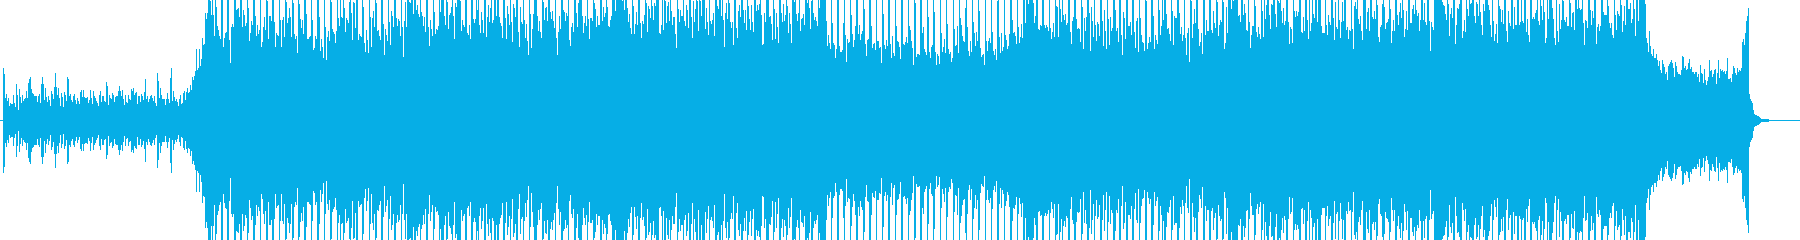 Corporate Orchestra Pop 1の再生済みの波形